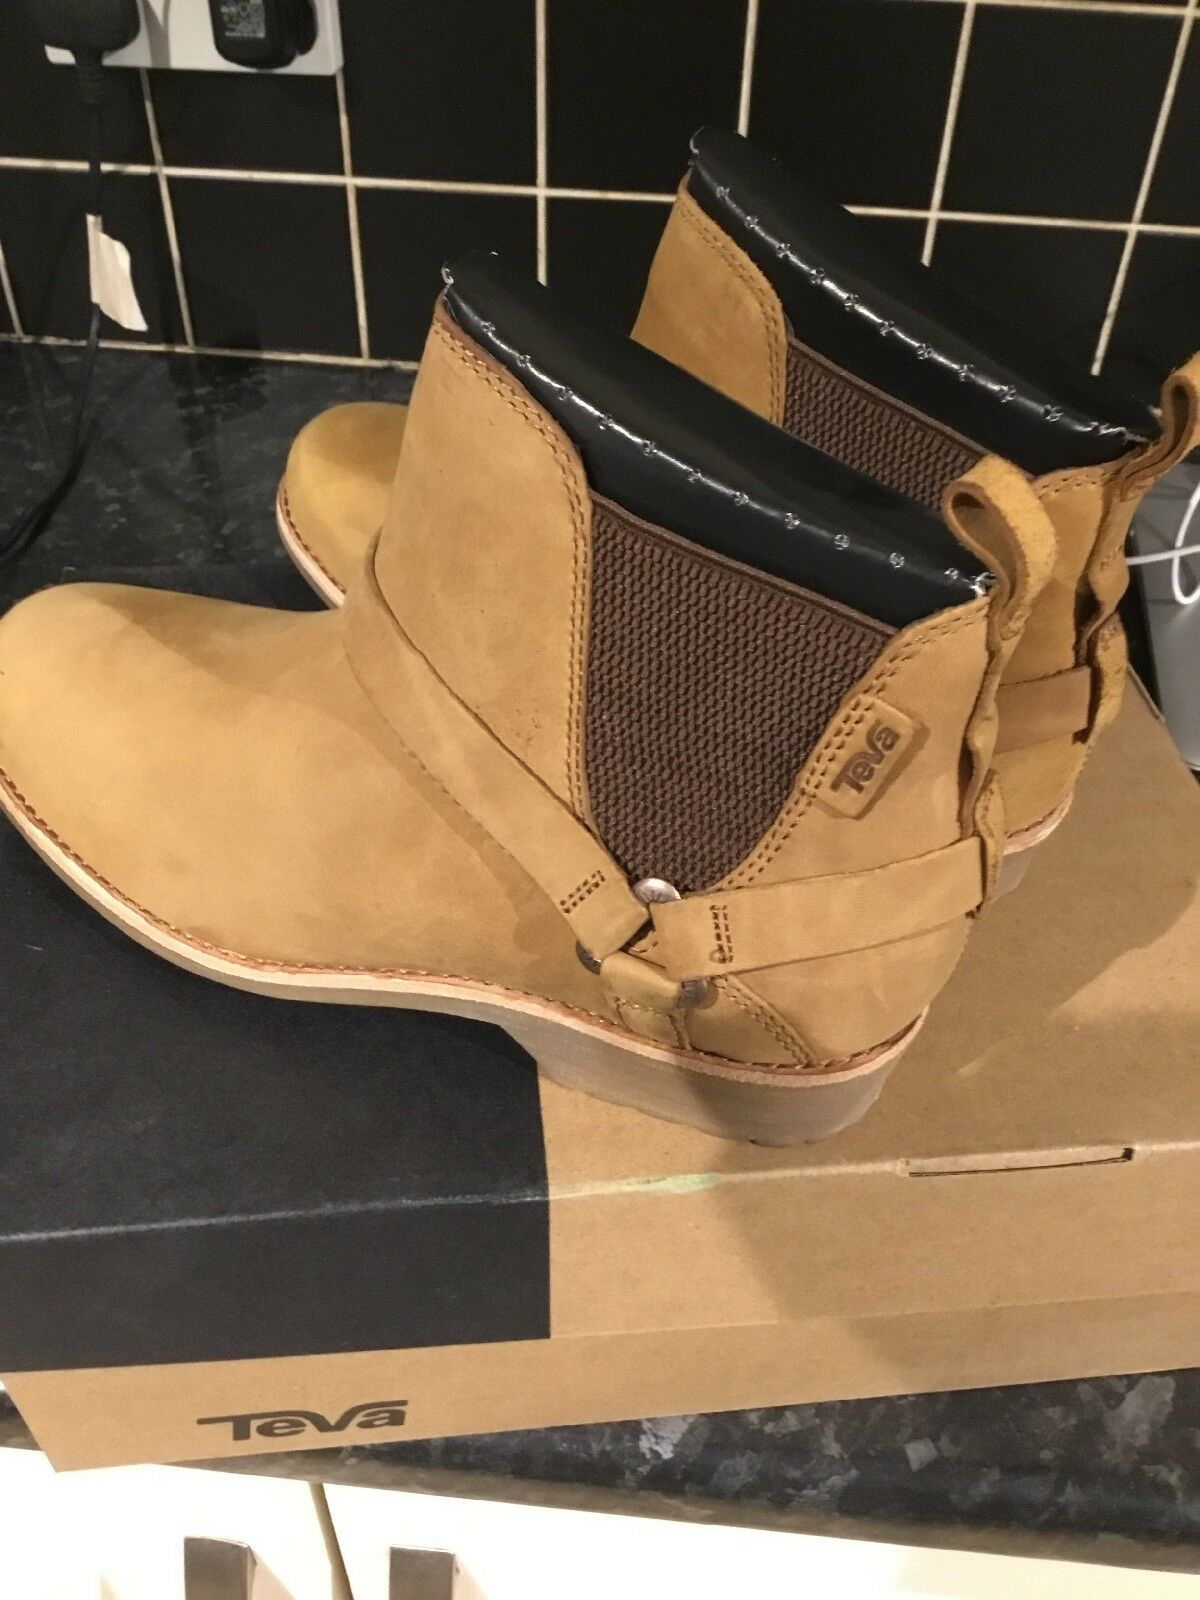 Teva De La Vina Dos Chelsea Boot In Pecan Size 7 Eu 40